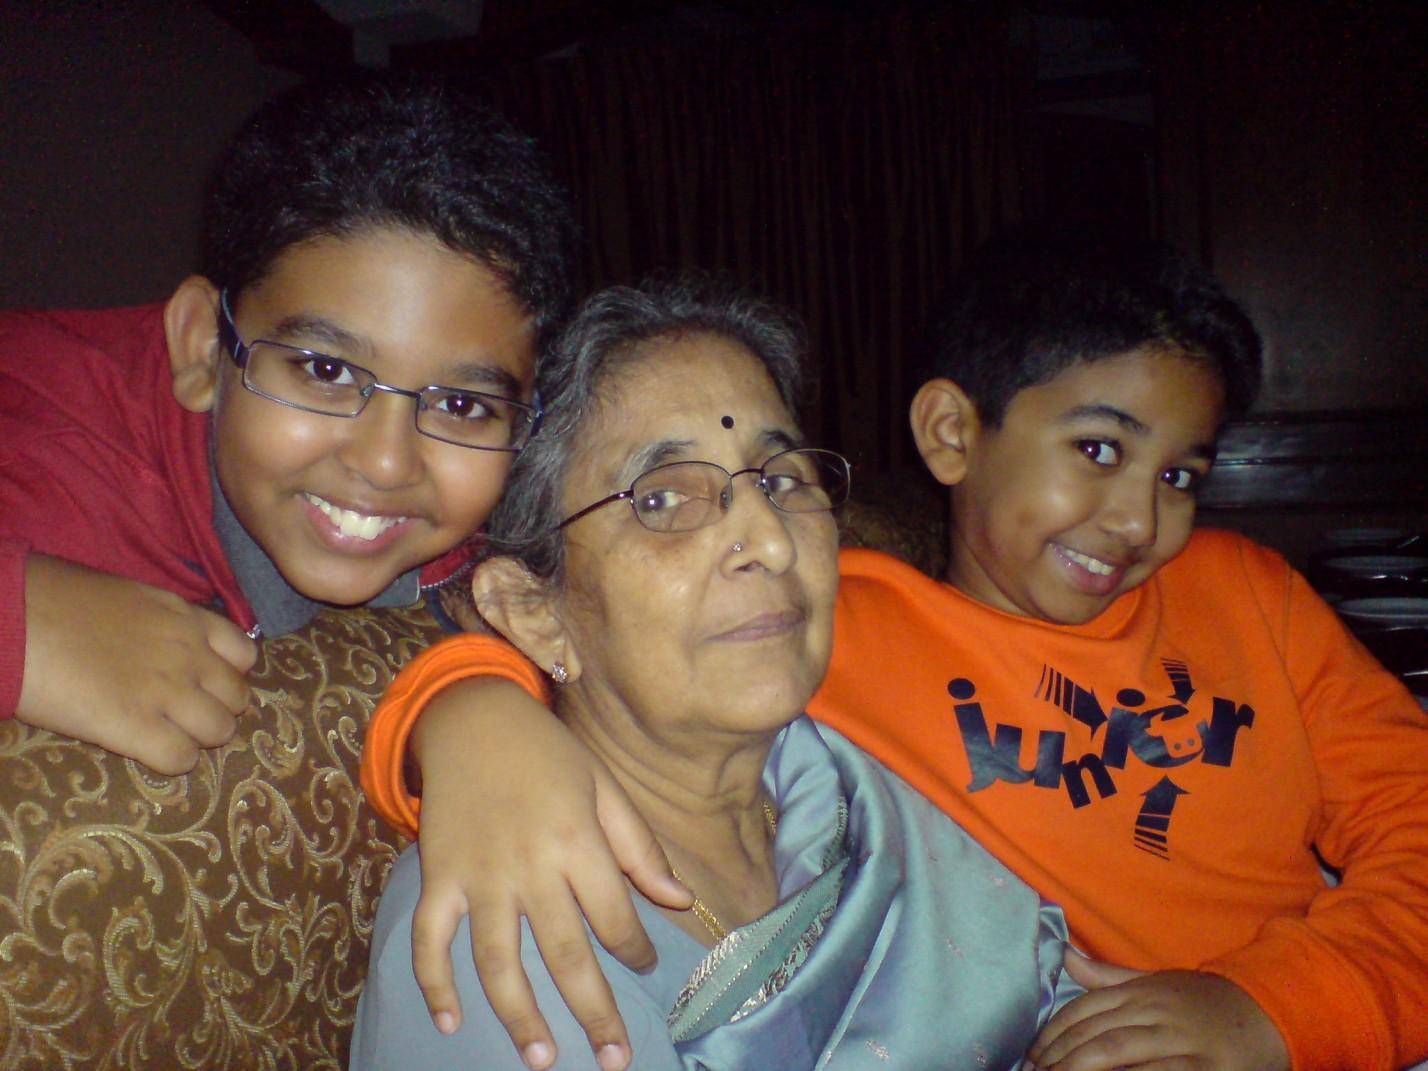 india1st2007-030.jpg